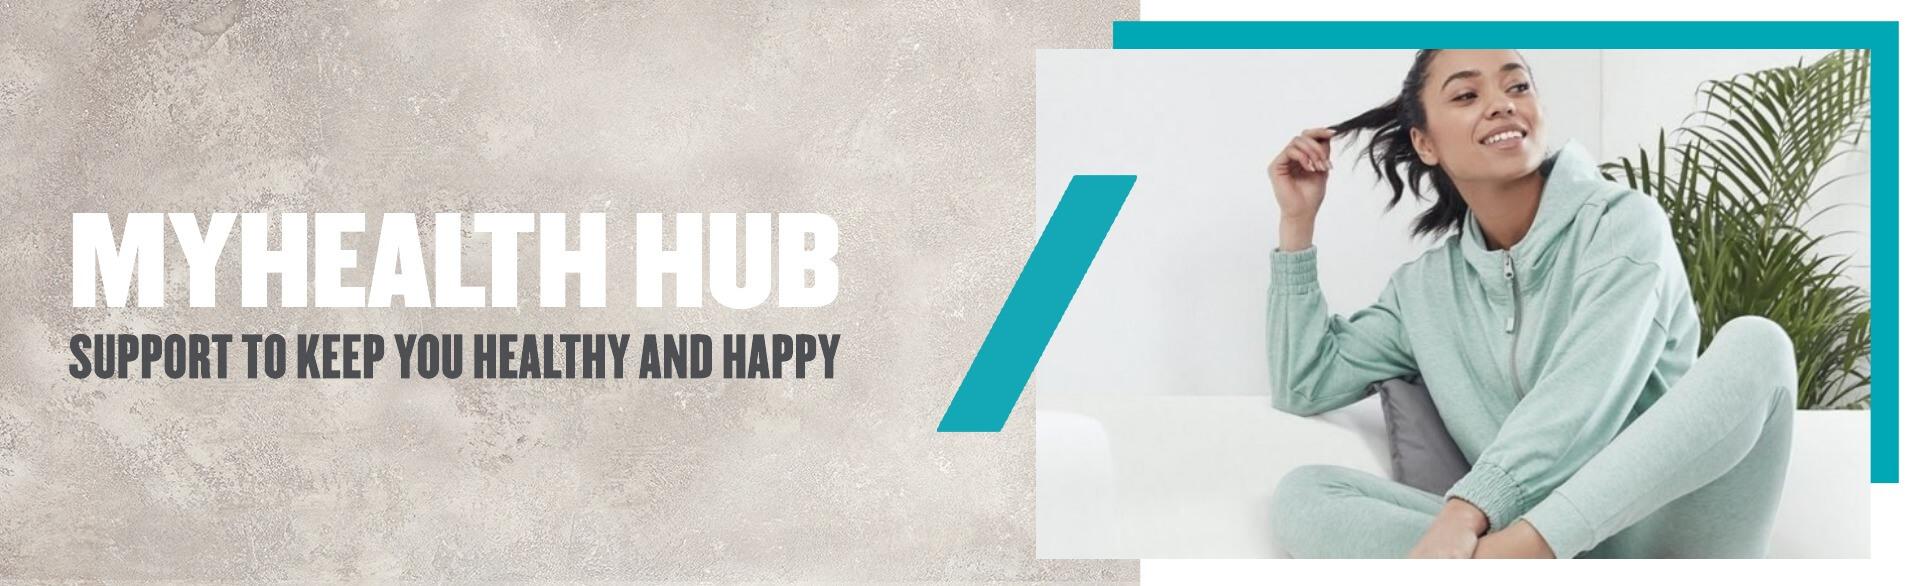 My Health Hub